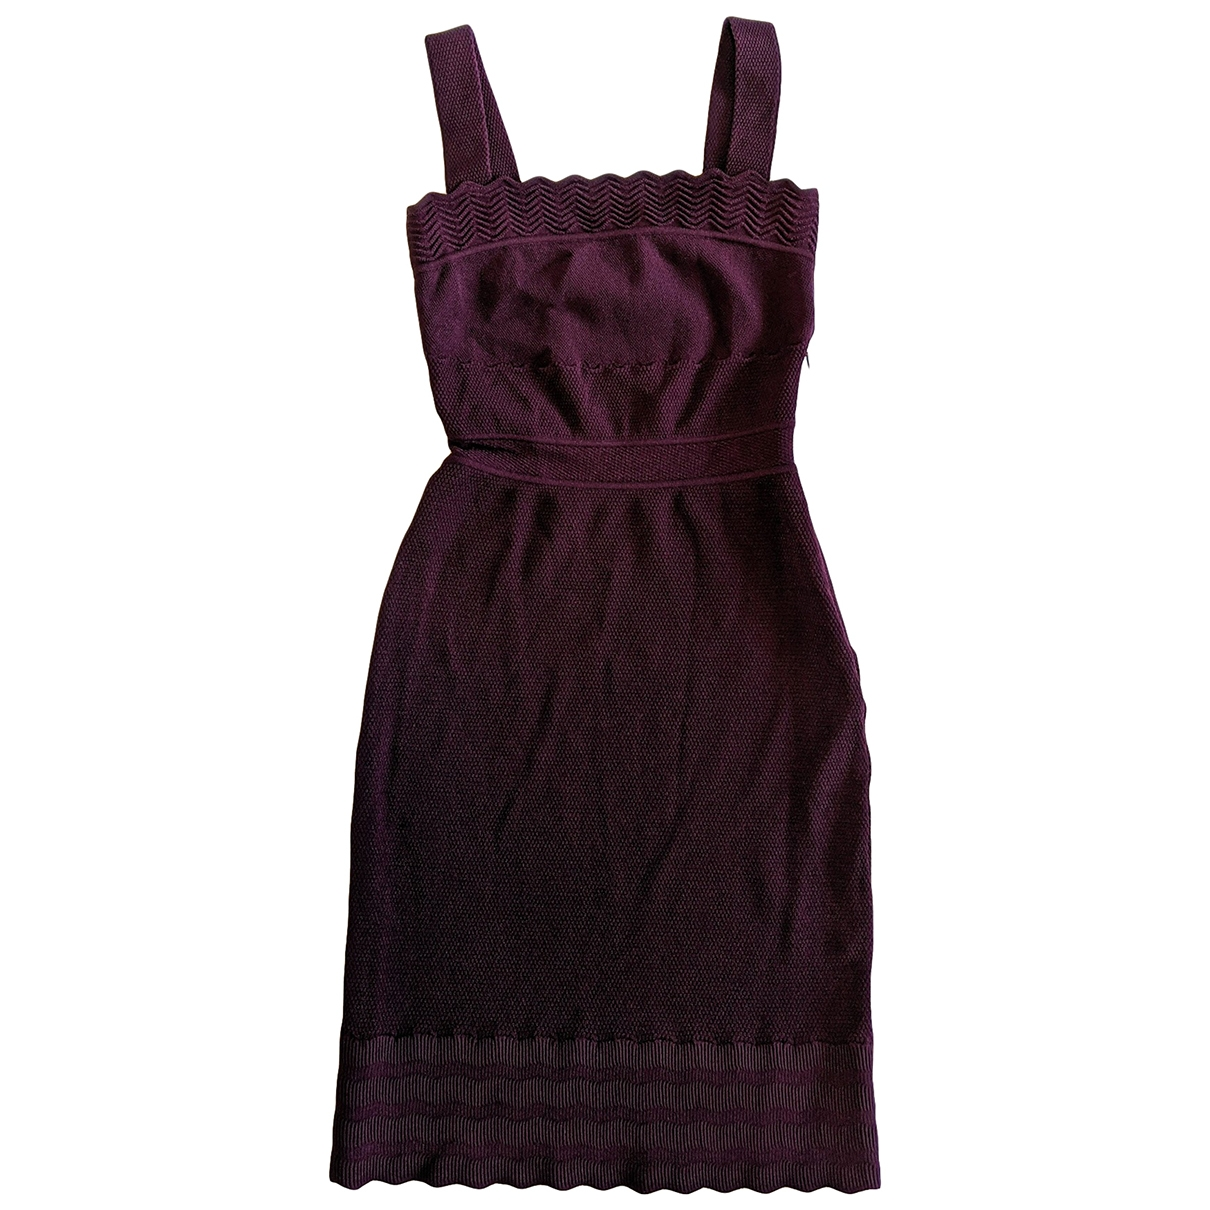 Dior \N Purple dress for Women 36 FR